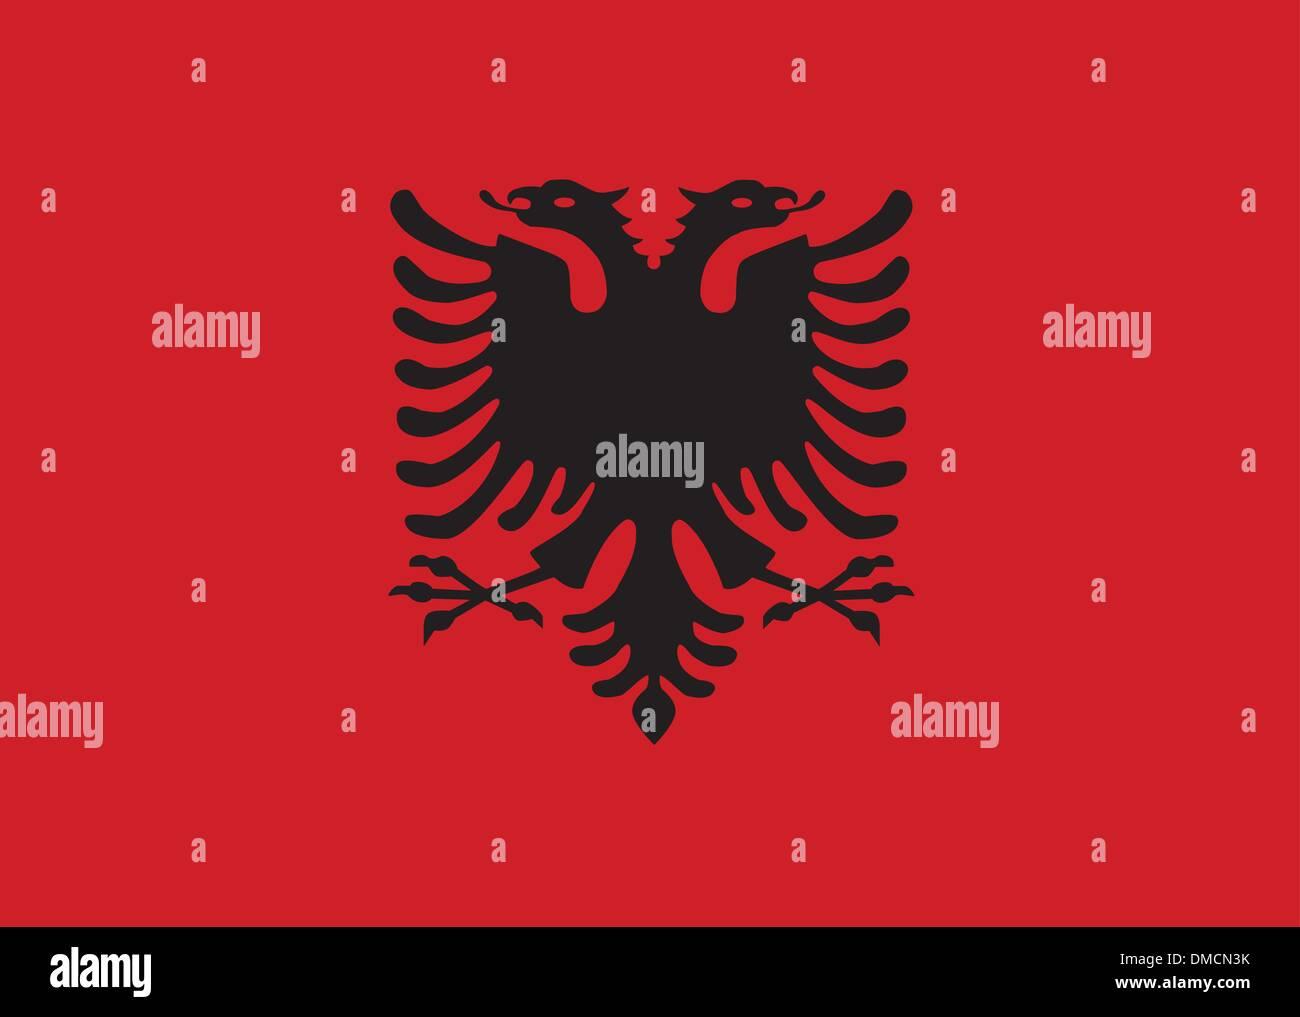 Flag of Albania - Stock Vector